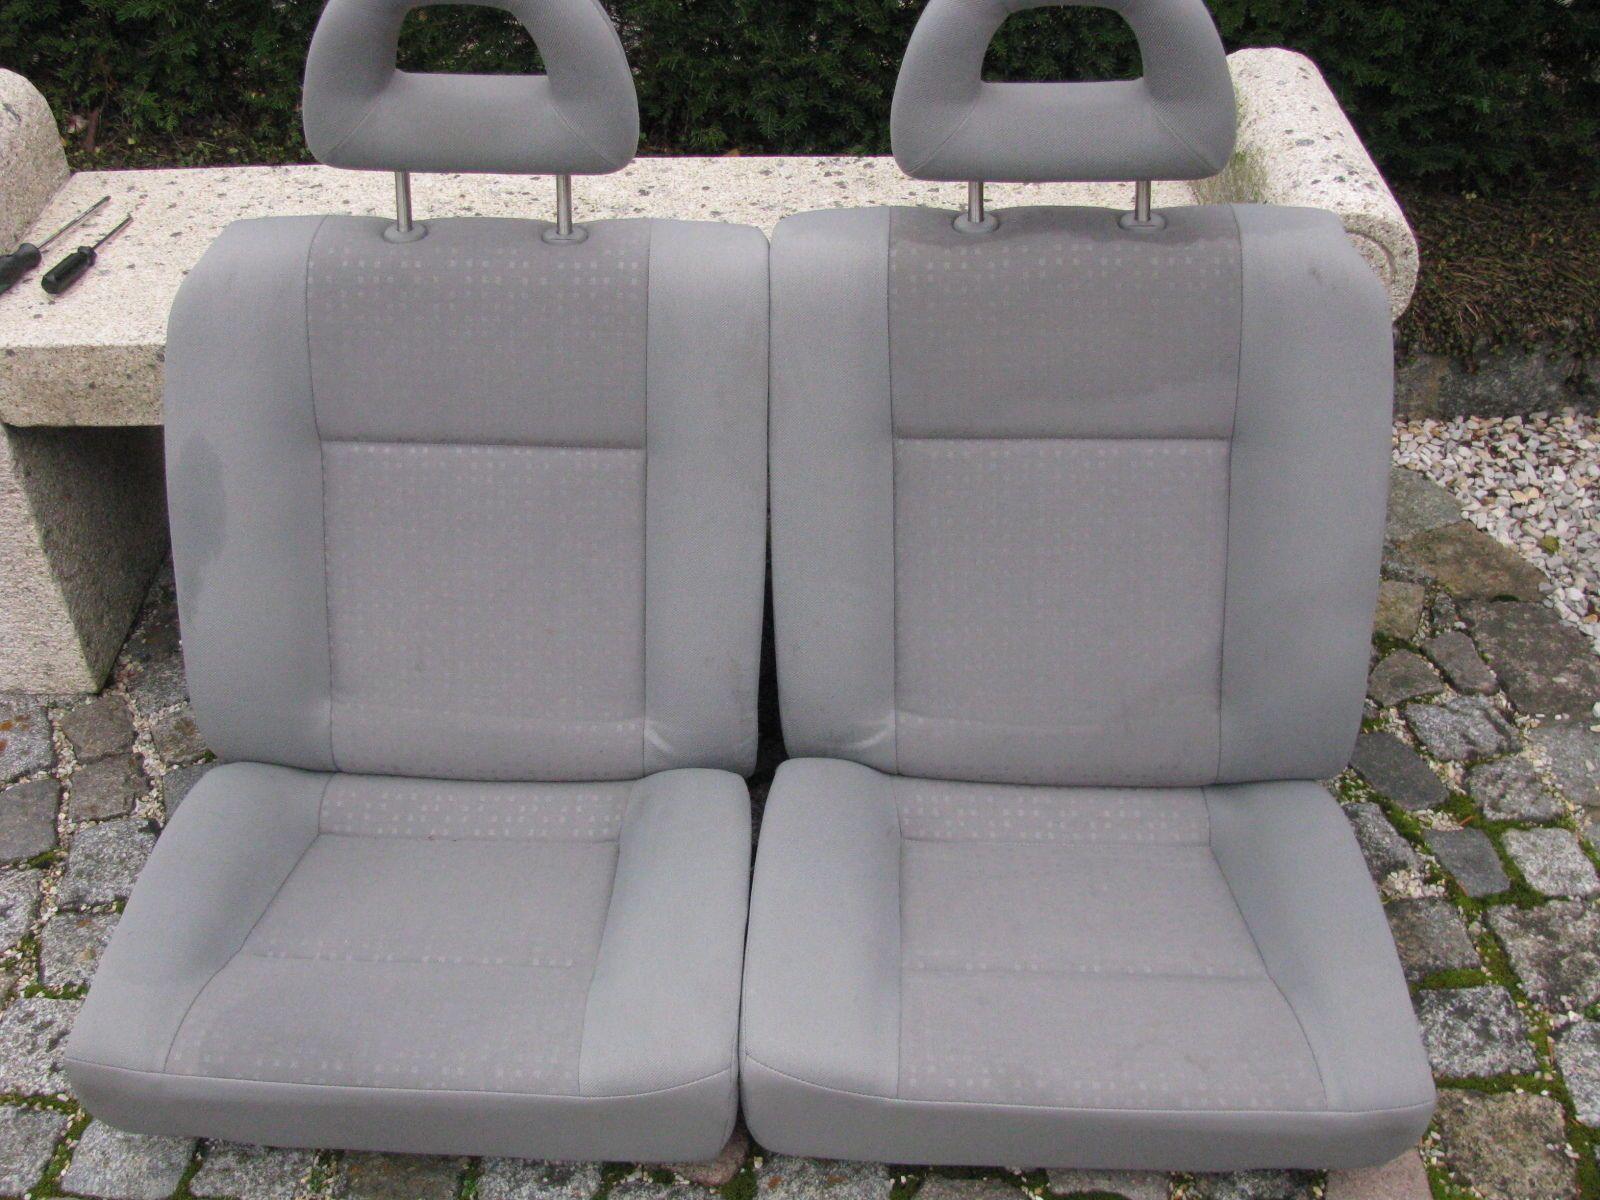 Seat arosa vw lupo rcksitzbank in grau mit kopfsttzen seat arosa vw lupo rcksitzbank in grau mit kopfsttzen fandeluxe Gallery